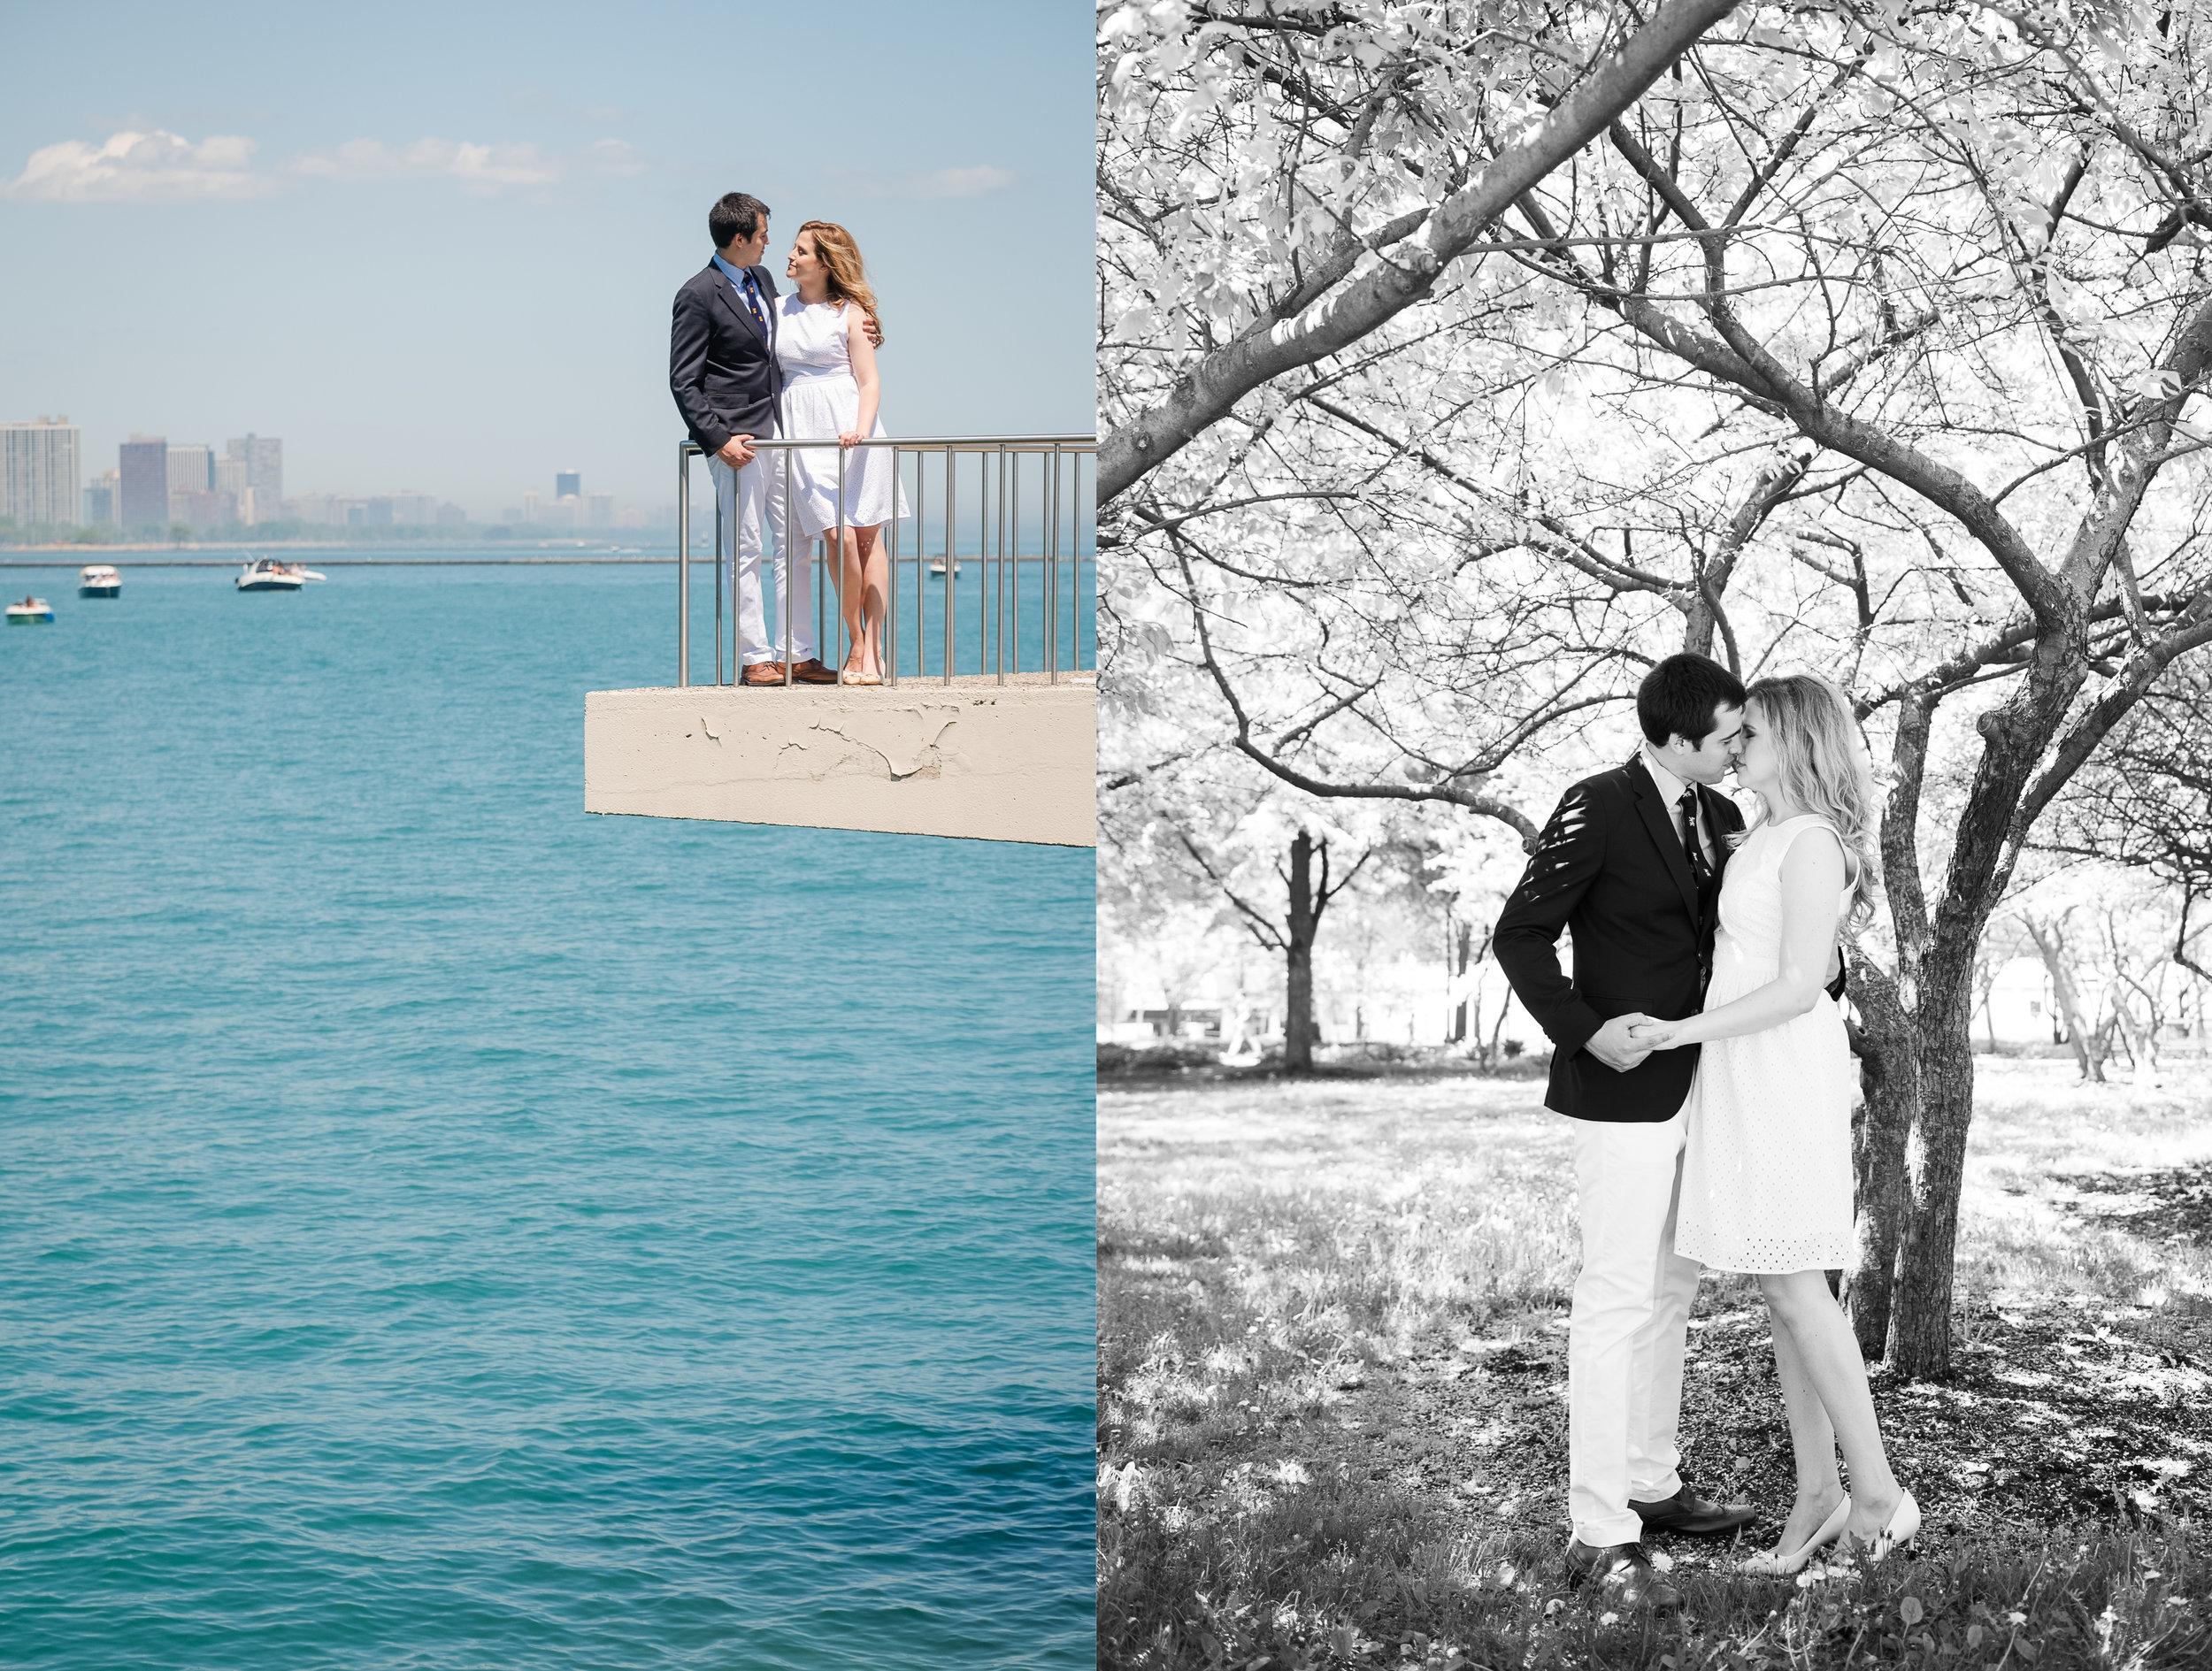 Chicago-downtown-summer-engagement-session-Kimberly-Hernan-MettsPhoto-11.jpg